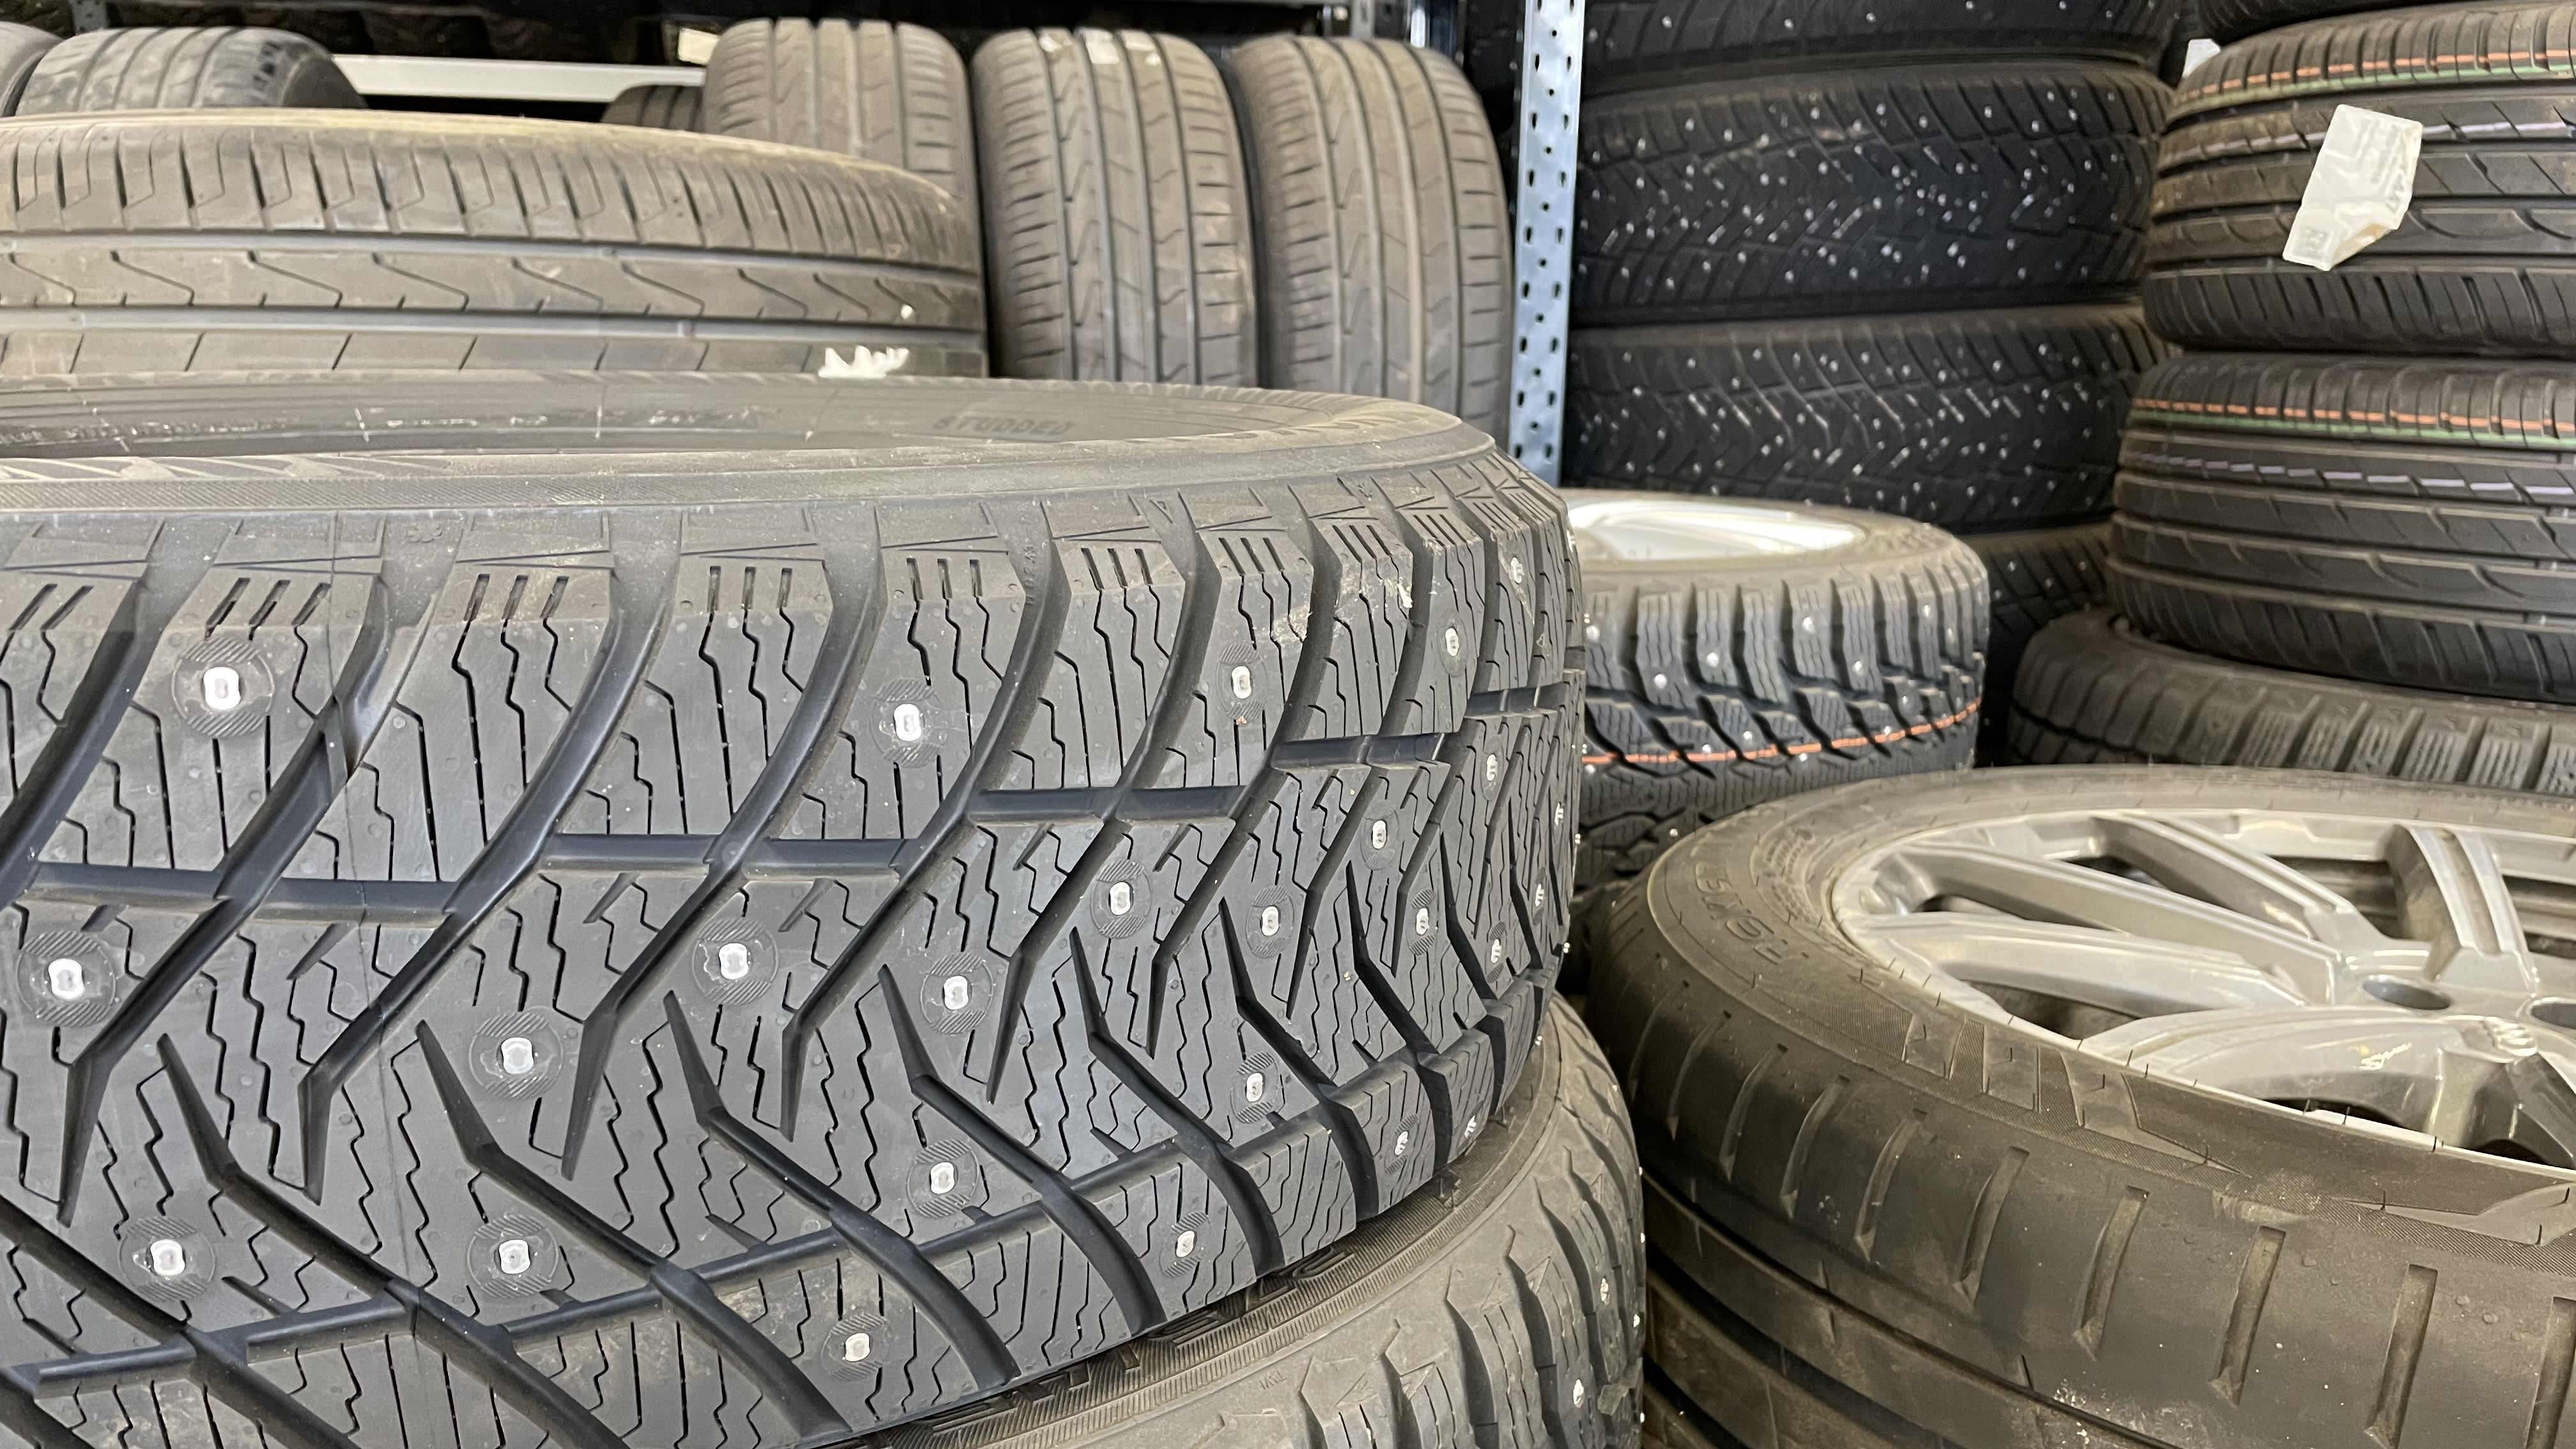 Autonrenkaita pinossa rengasliike JV-renkaassa Joensuussa.